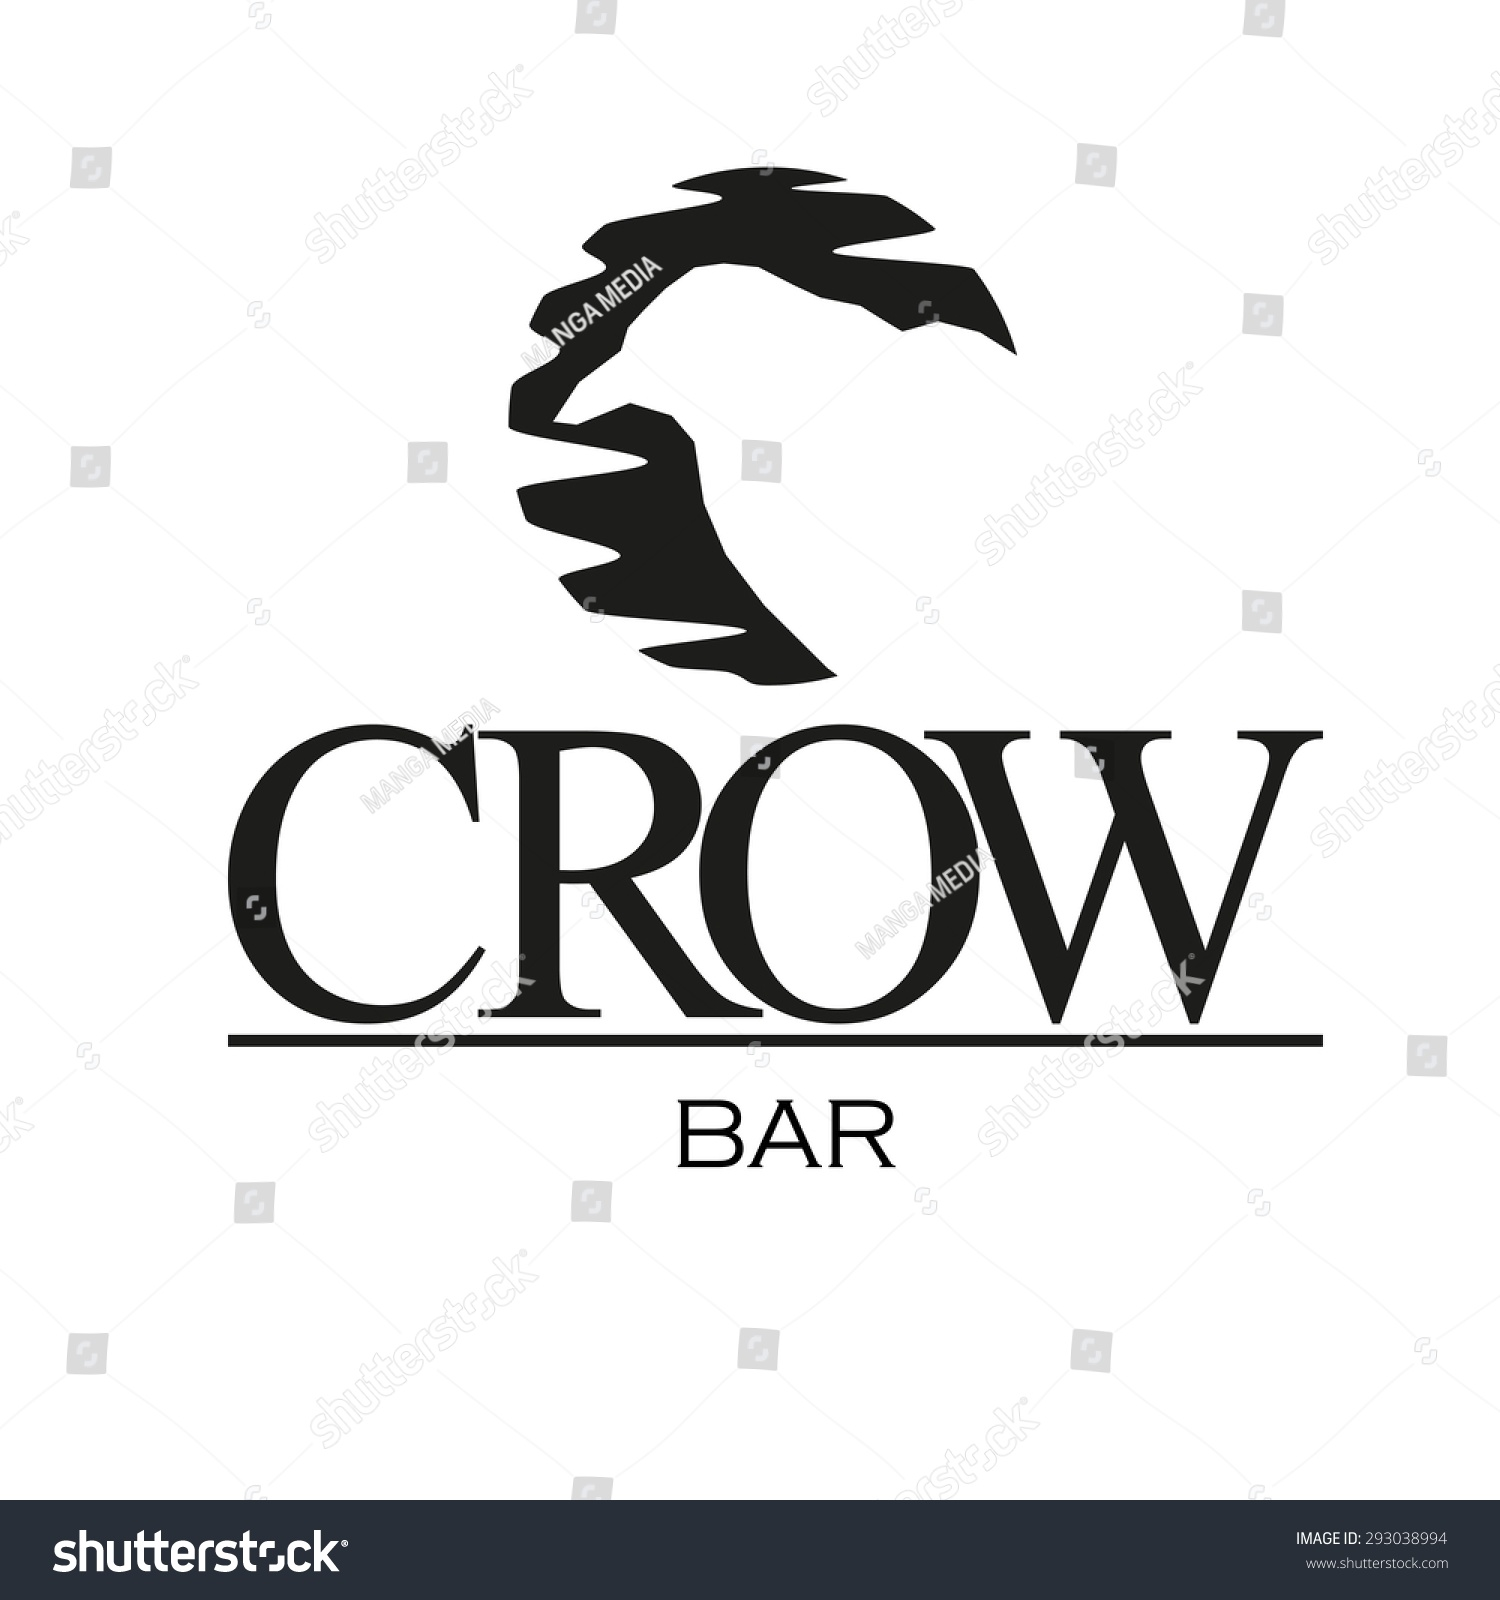 Silhouette crow logo bar stock vector 293038994 shutterstock silhouette of crow logo for bar sciox Choice Image